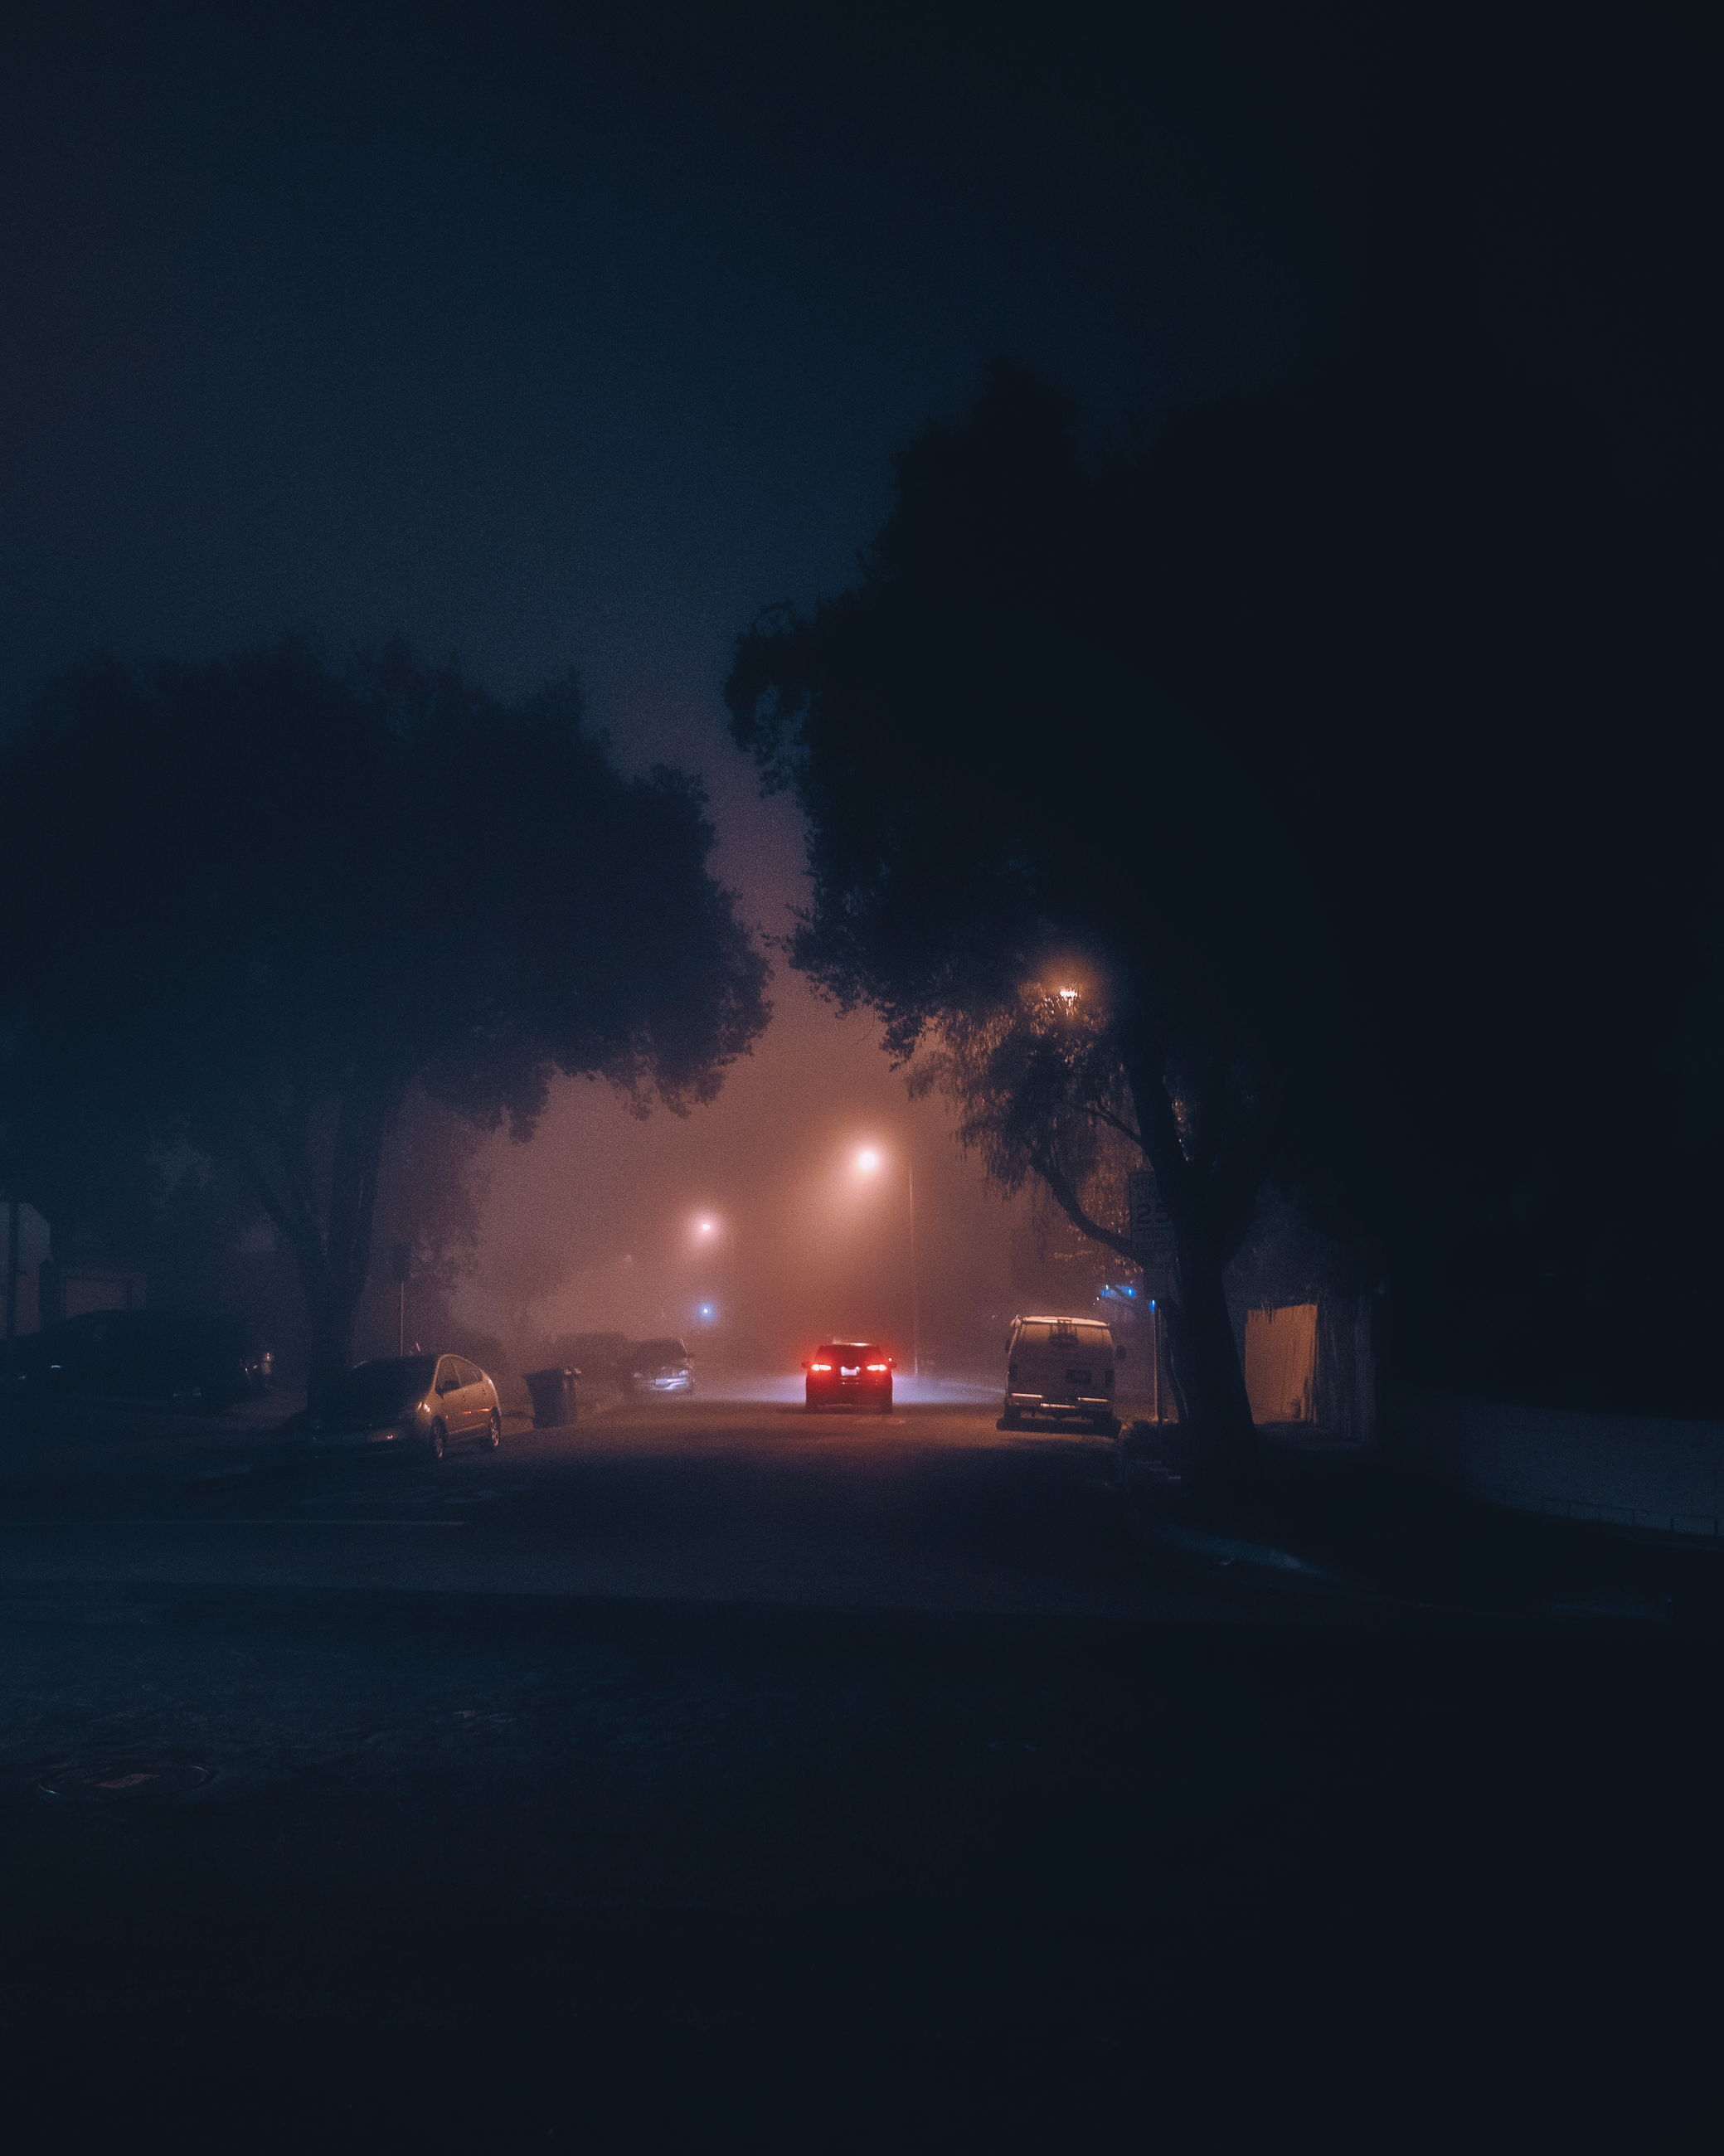 night, transportation, illuminated, car, mode of transportation, motor vehicle, street, land vehicle, no people, nature, sky, city, road, tree, outdoors, street light, plant, lighting equipment, motion, architecture, dark